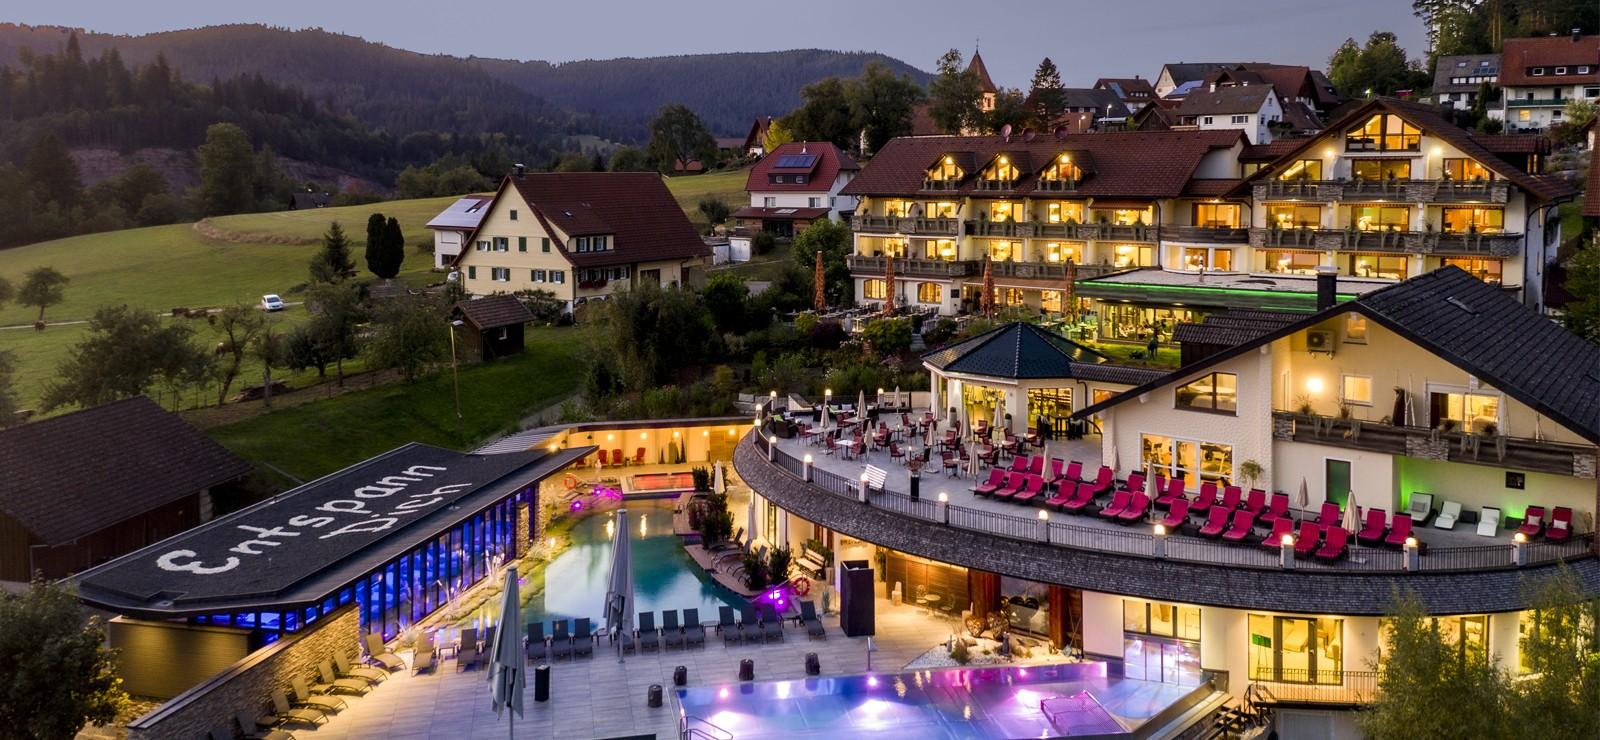 Hotel Heselbacher Hof Bilder | Bild 1